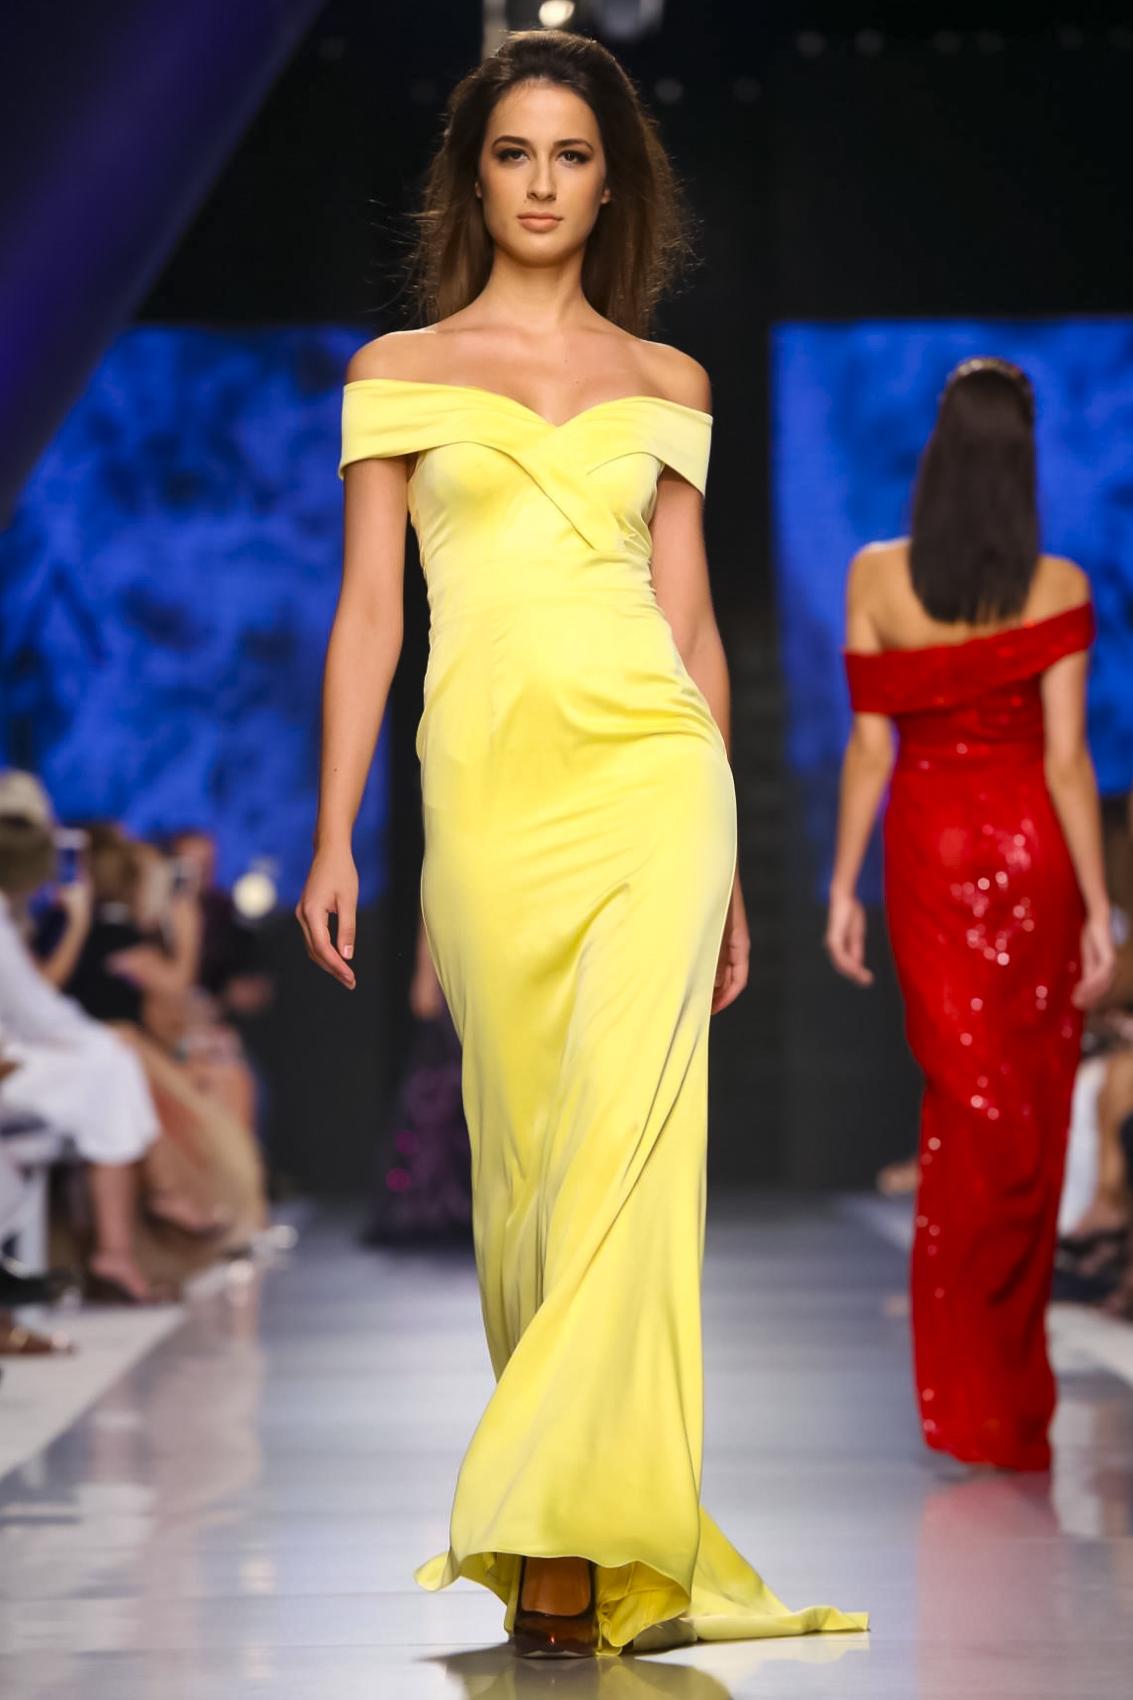 Arab Fashion Week - AIISHA Resort 2018 Collection L'Azur